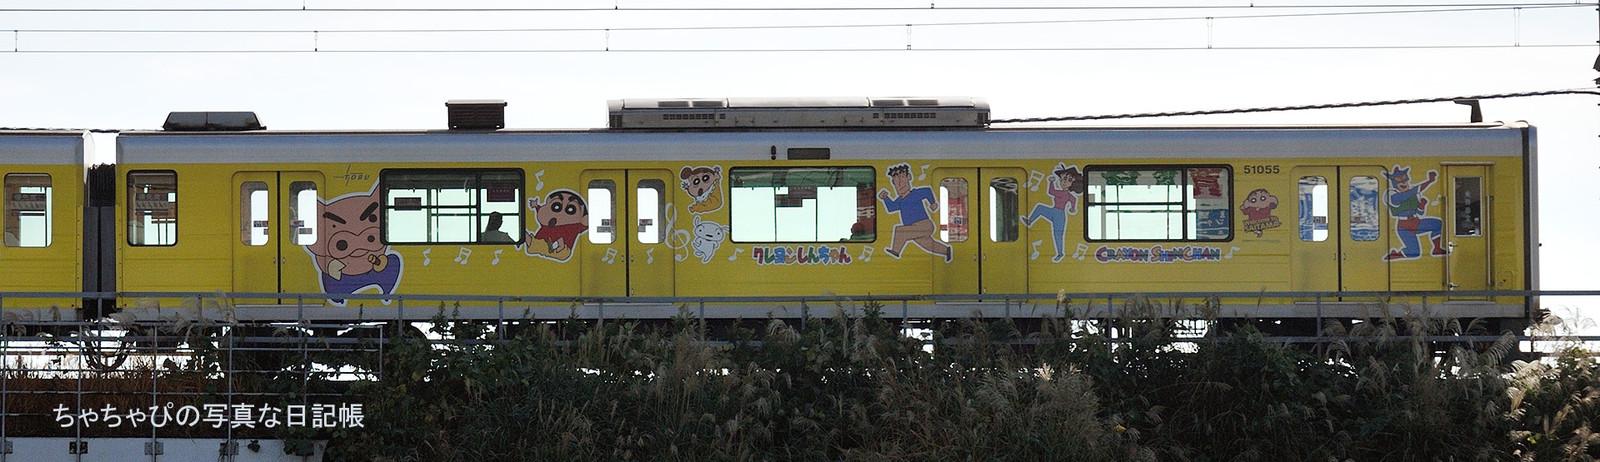 51055